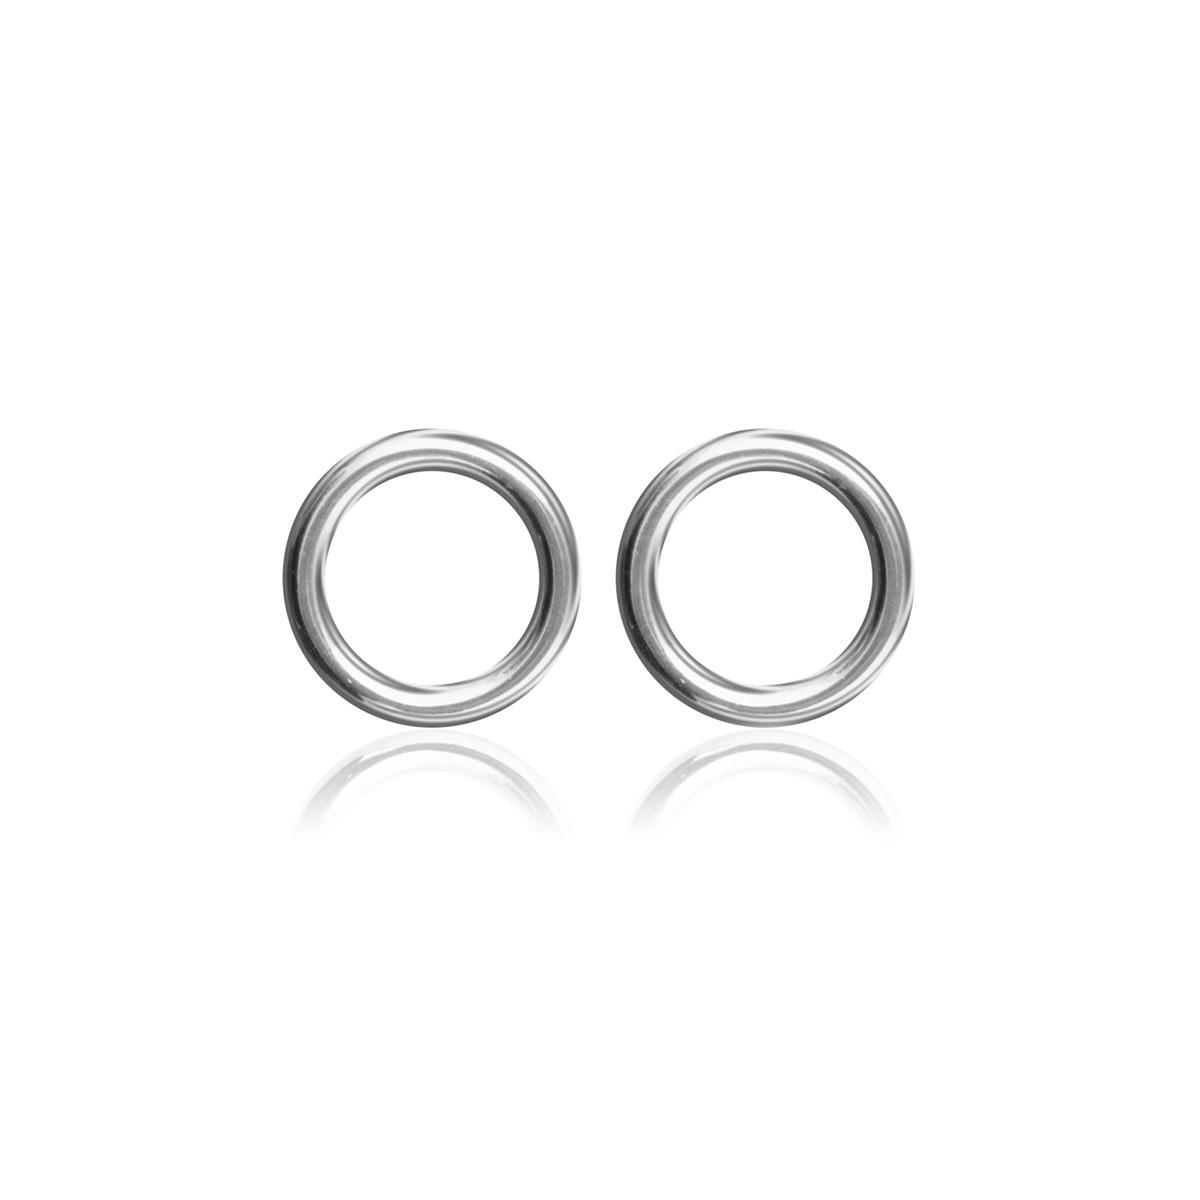 Circle-studs-Rodium-pläterad-silver-Sophie-by-Sophie-R